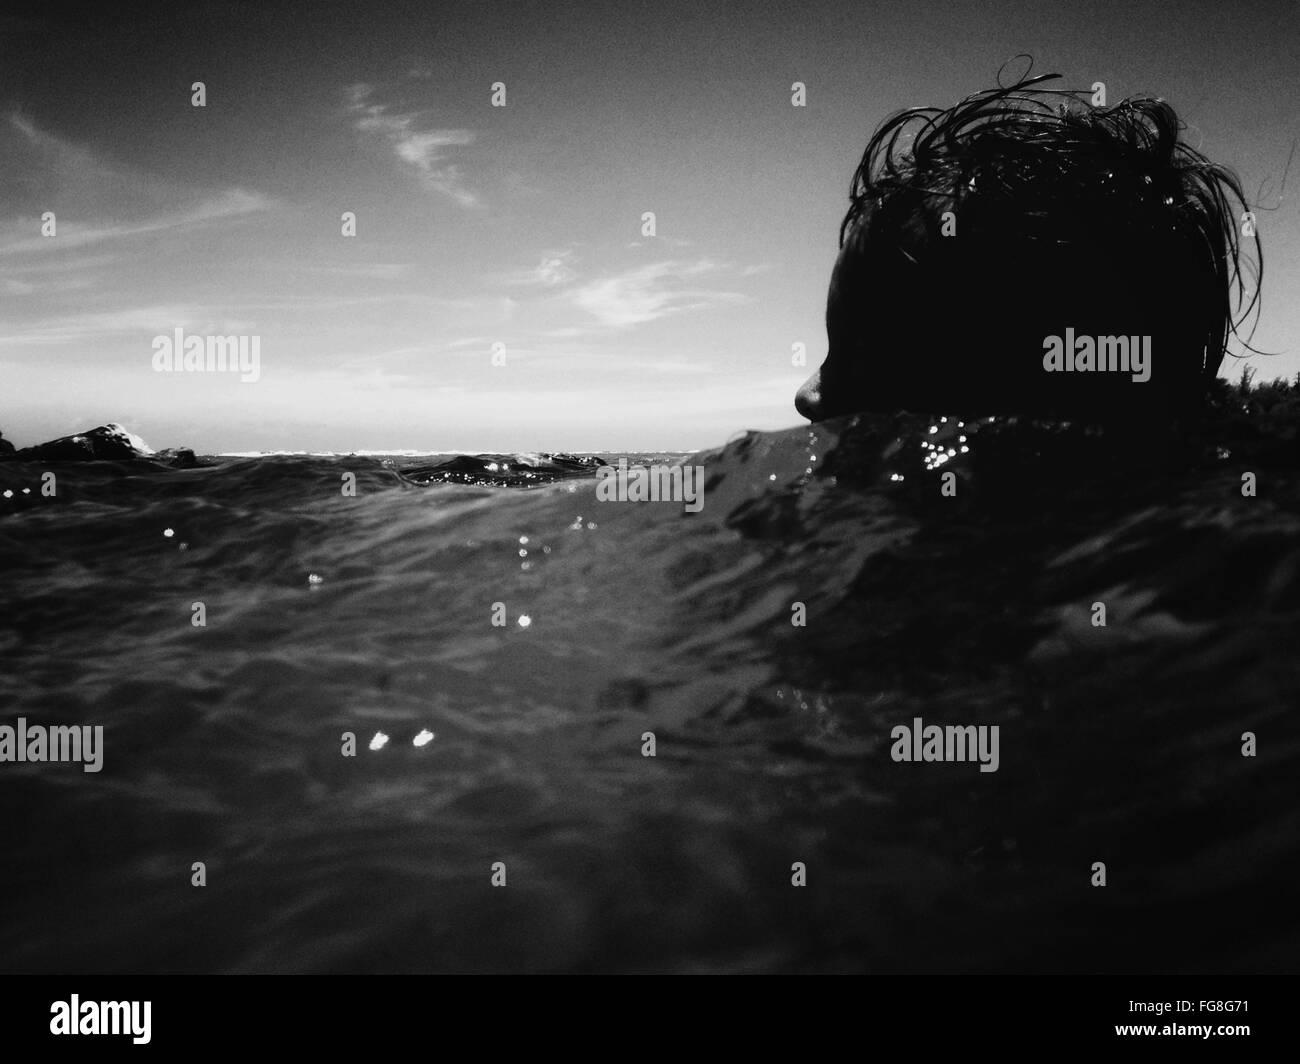 Oberflächenniveau Person im Meer Stockbild